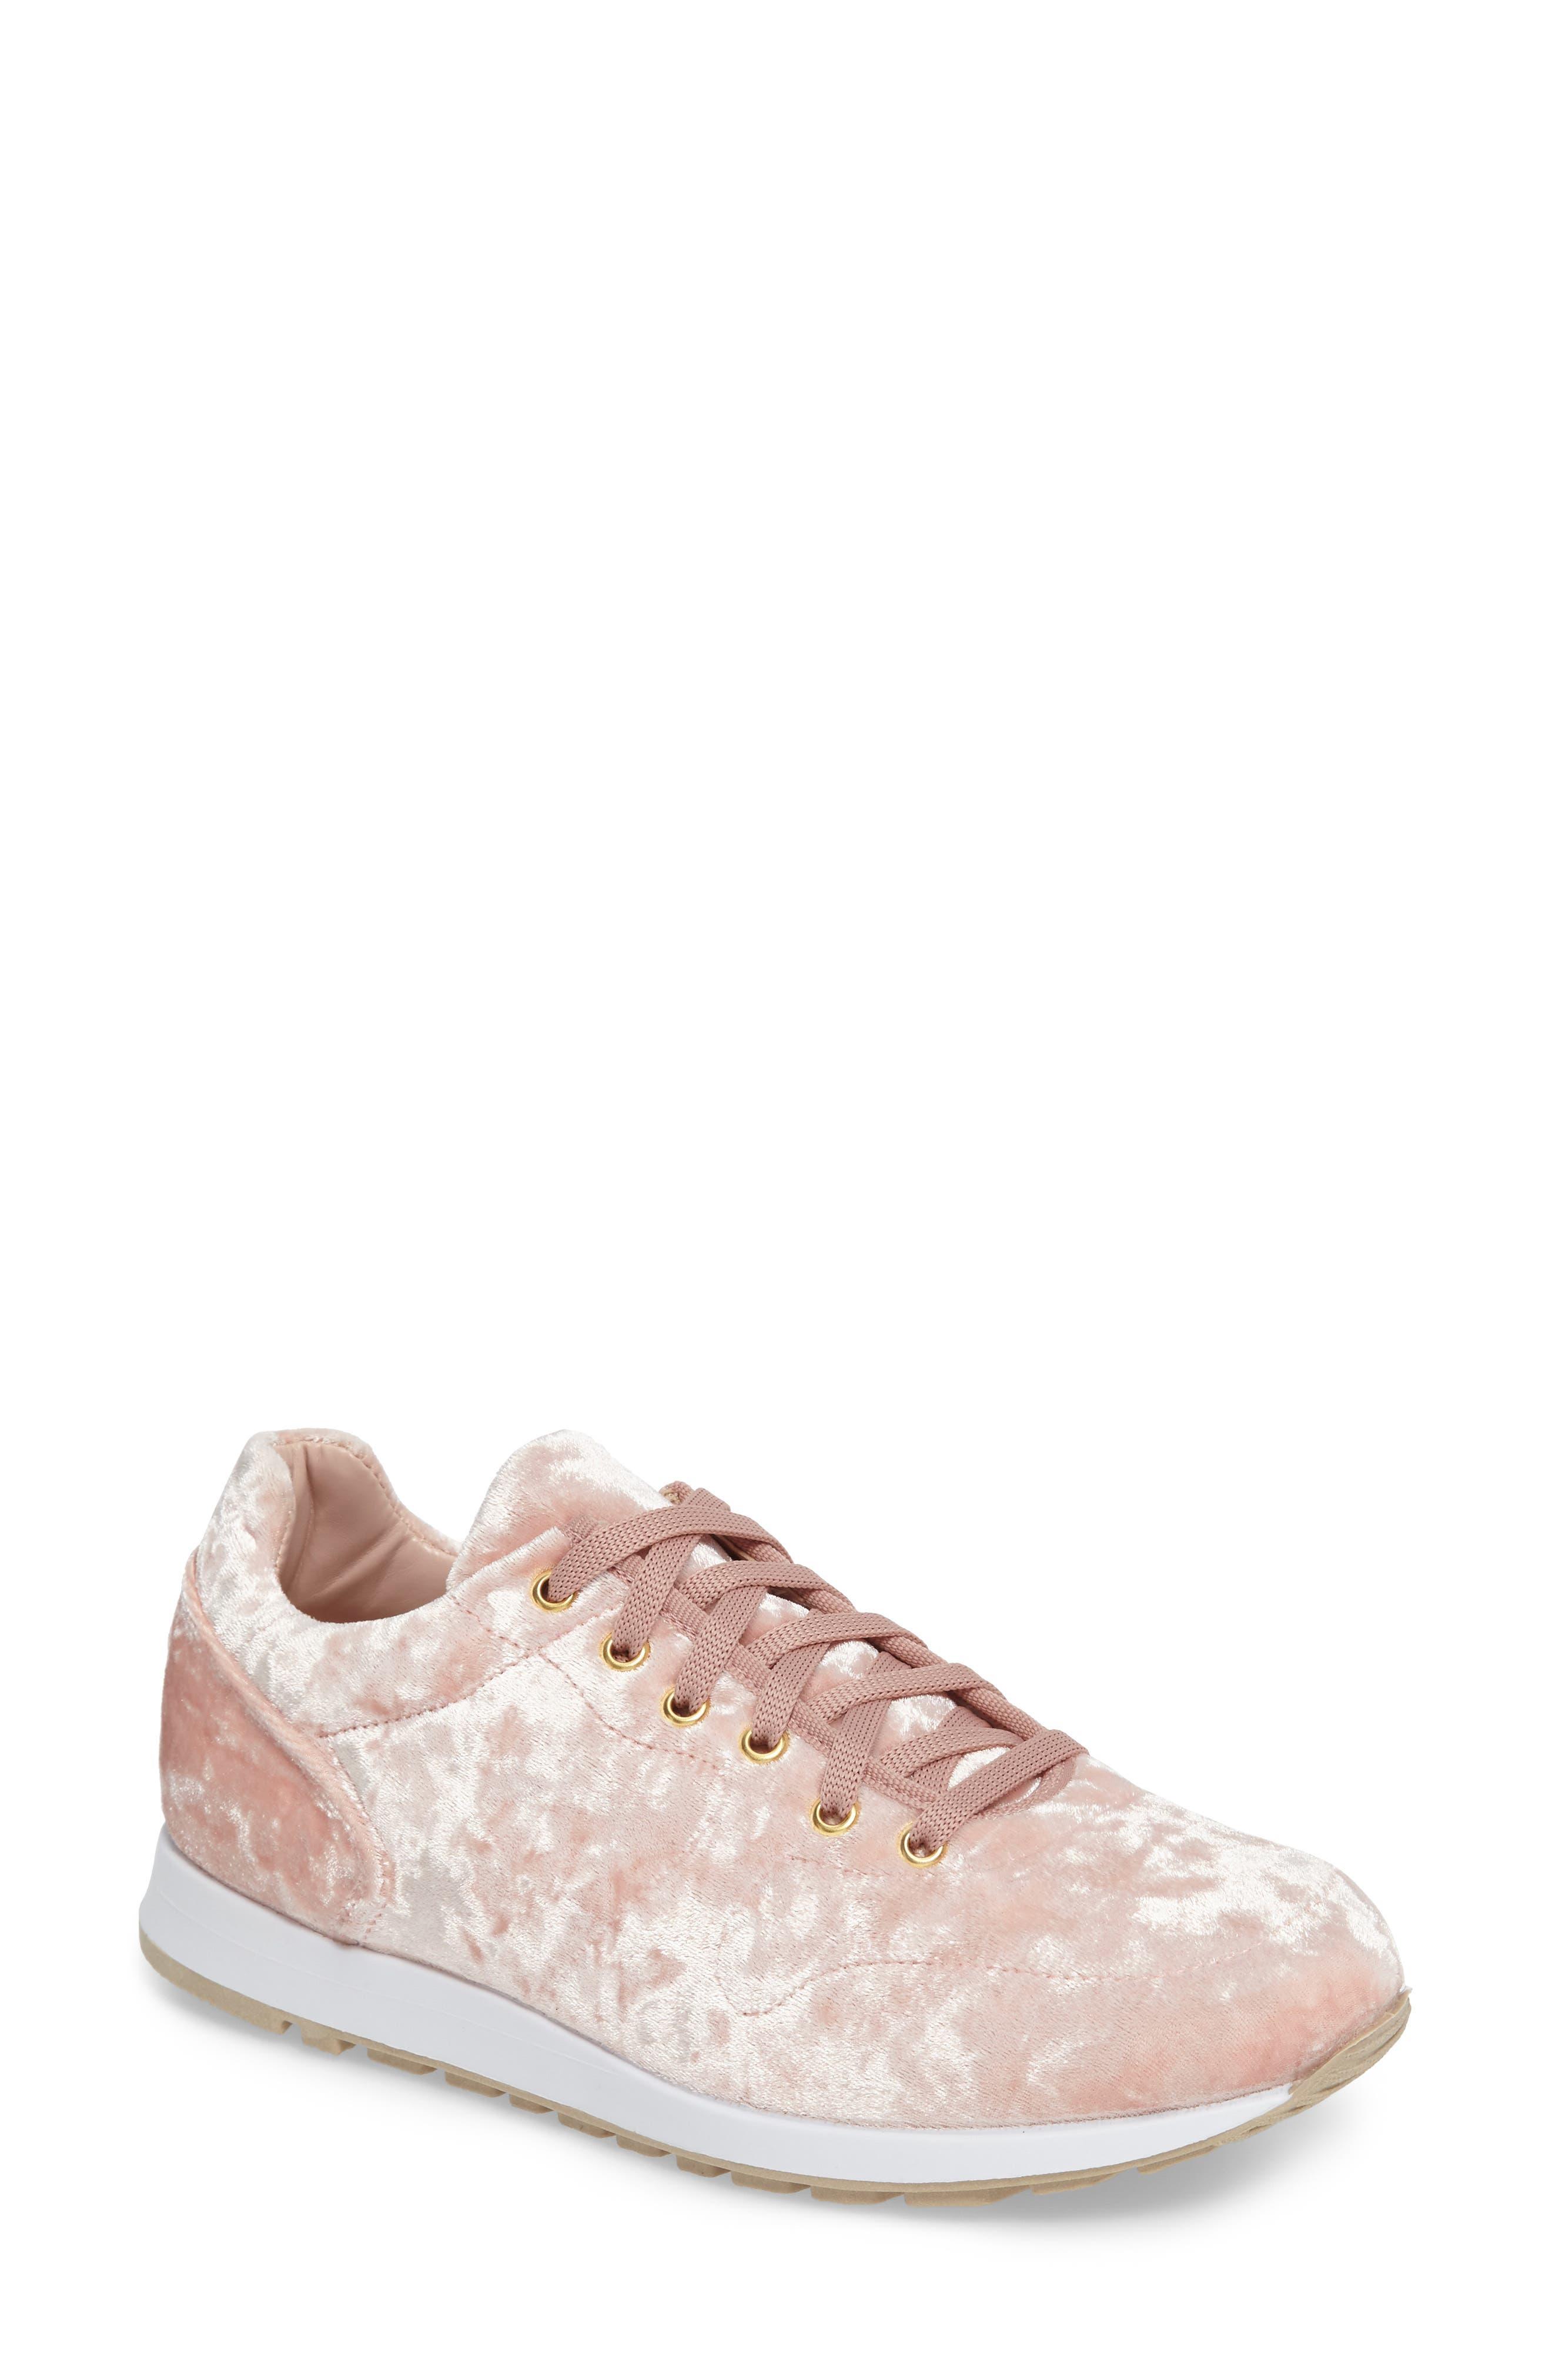 Croatia Velvet Sneaker,                             Main thumbnail 1, color,                             650